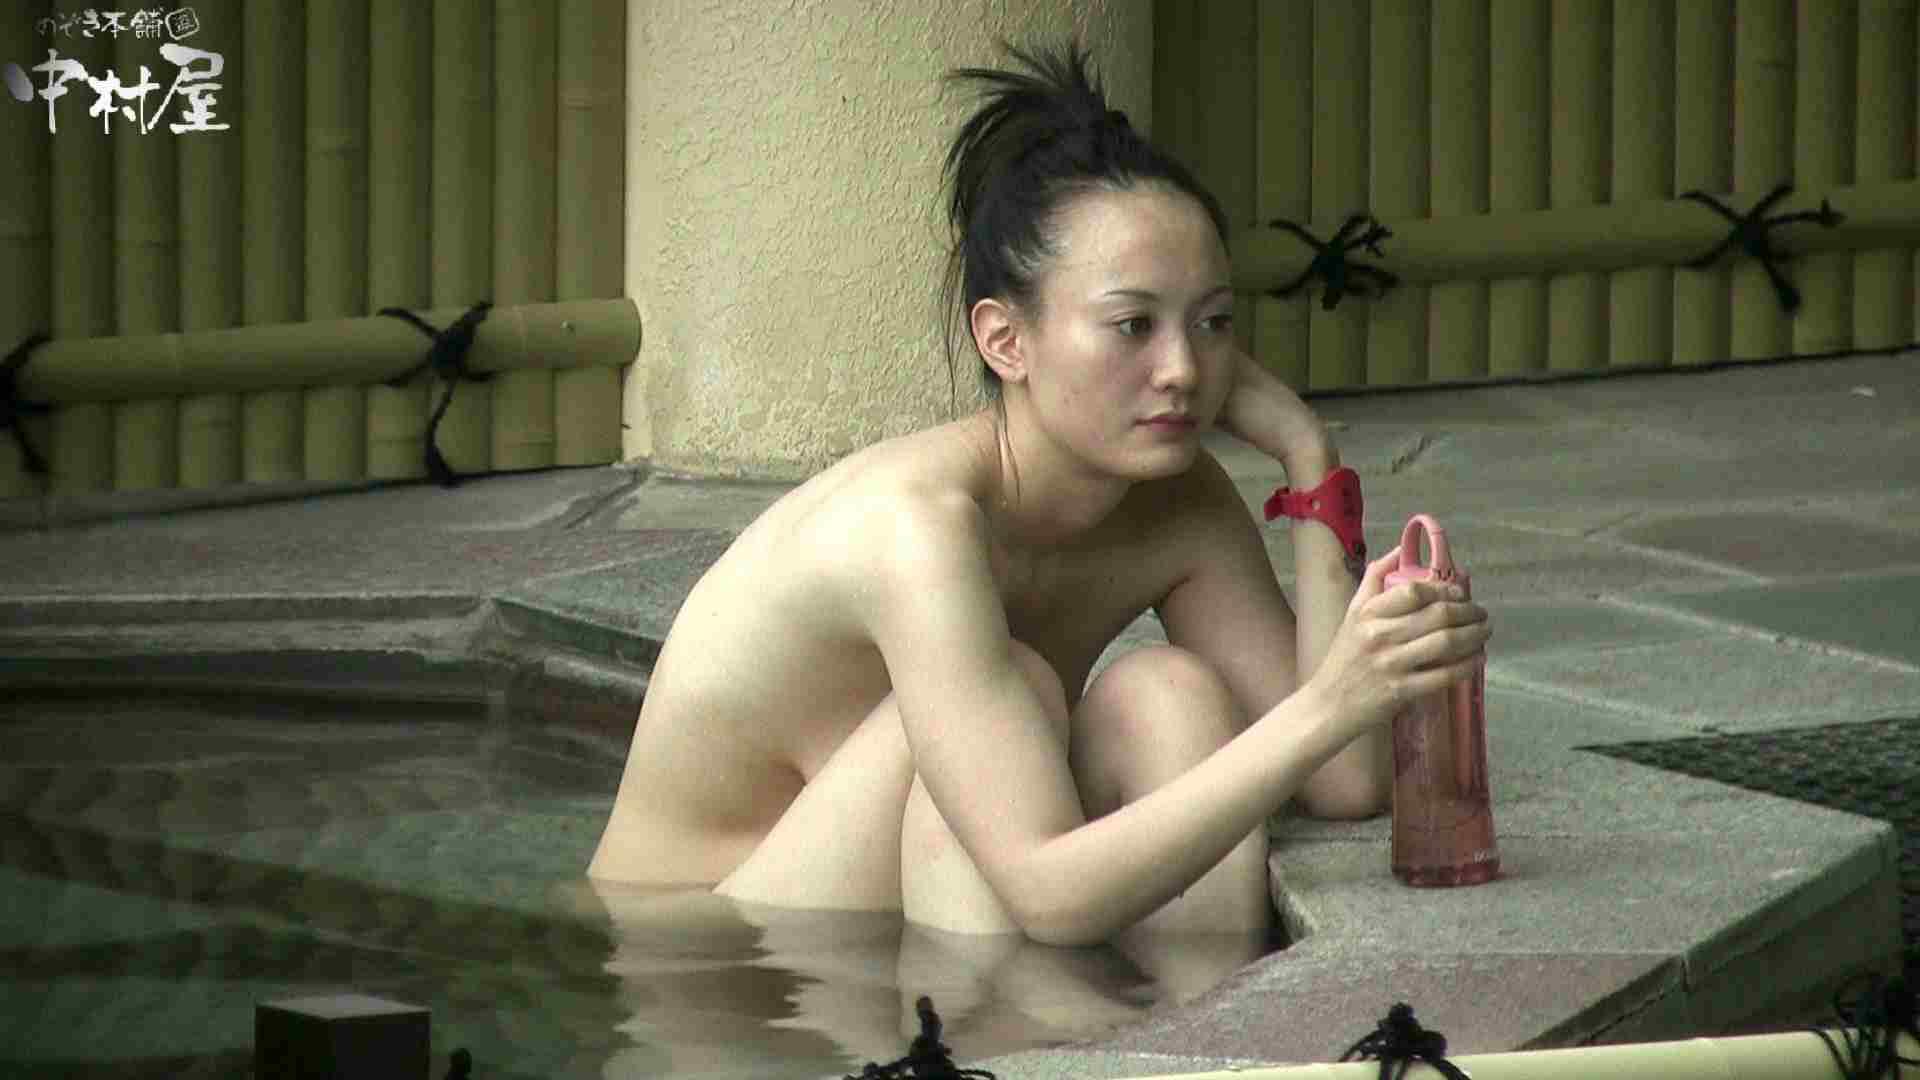 Aquaな露天風呂Vol.900 OLのエロ生活 すけべAV動画紹介 88連発 71